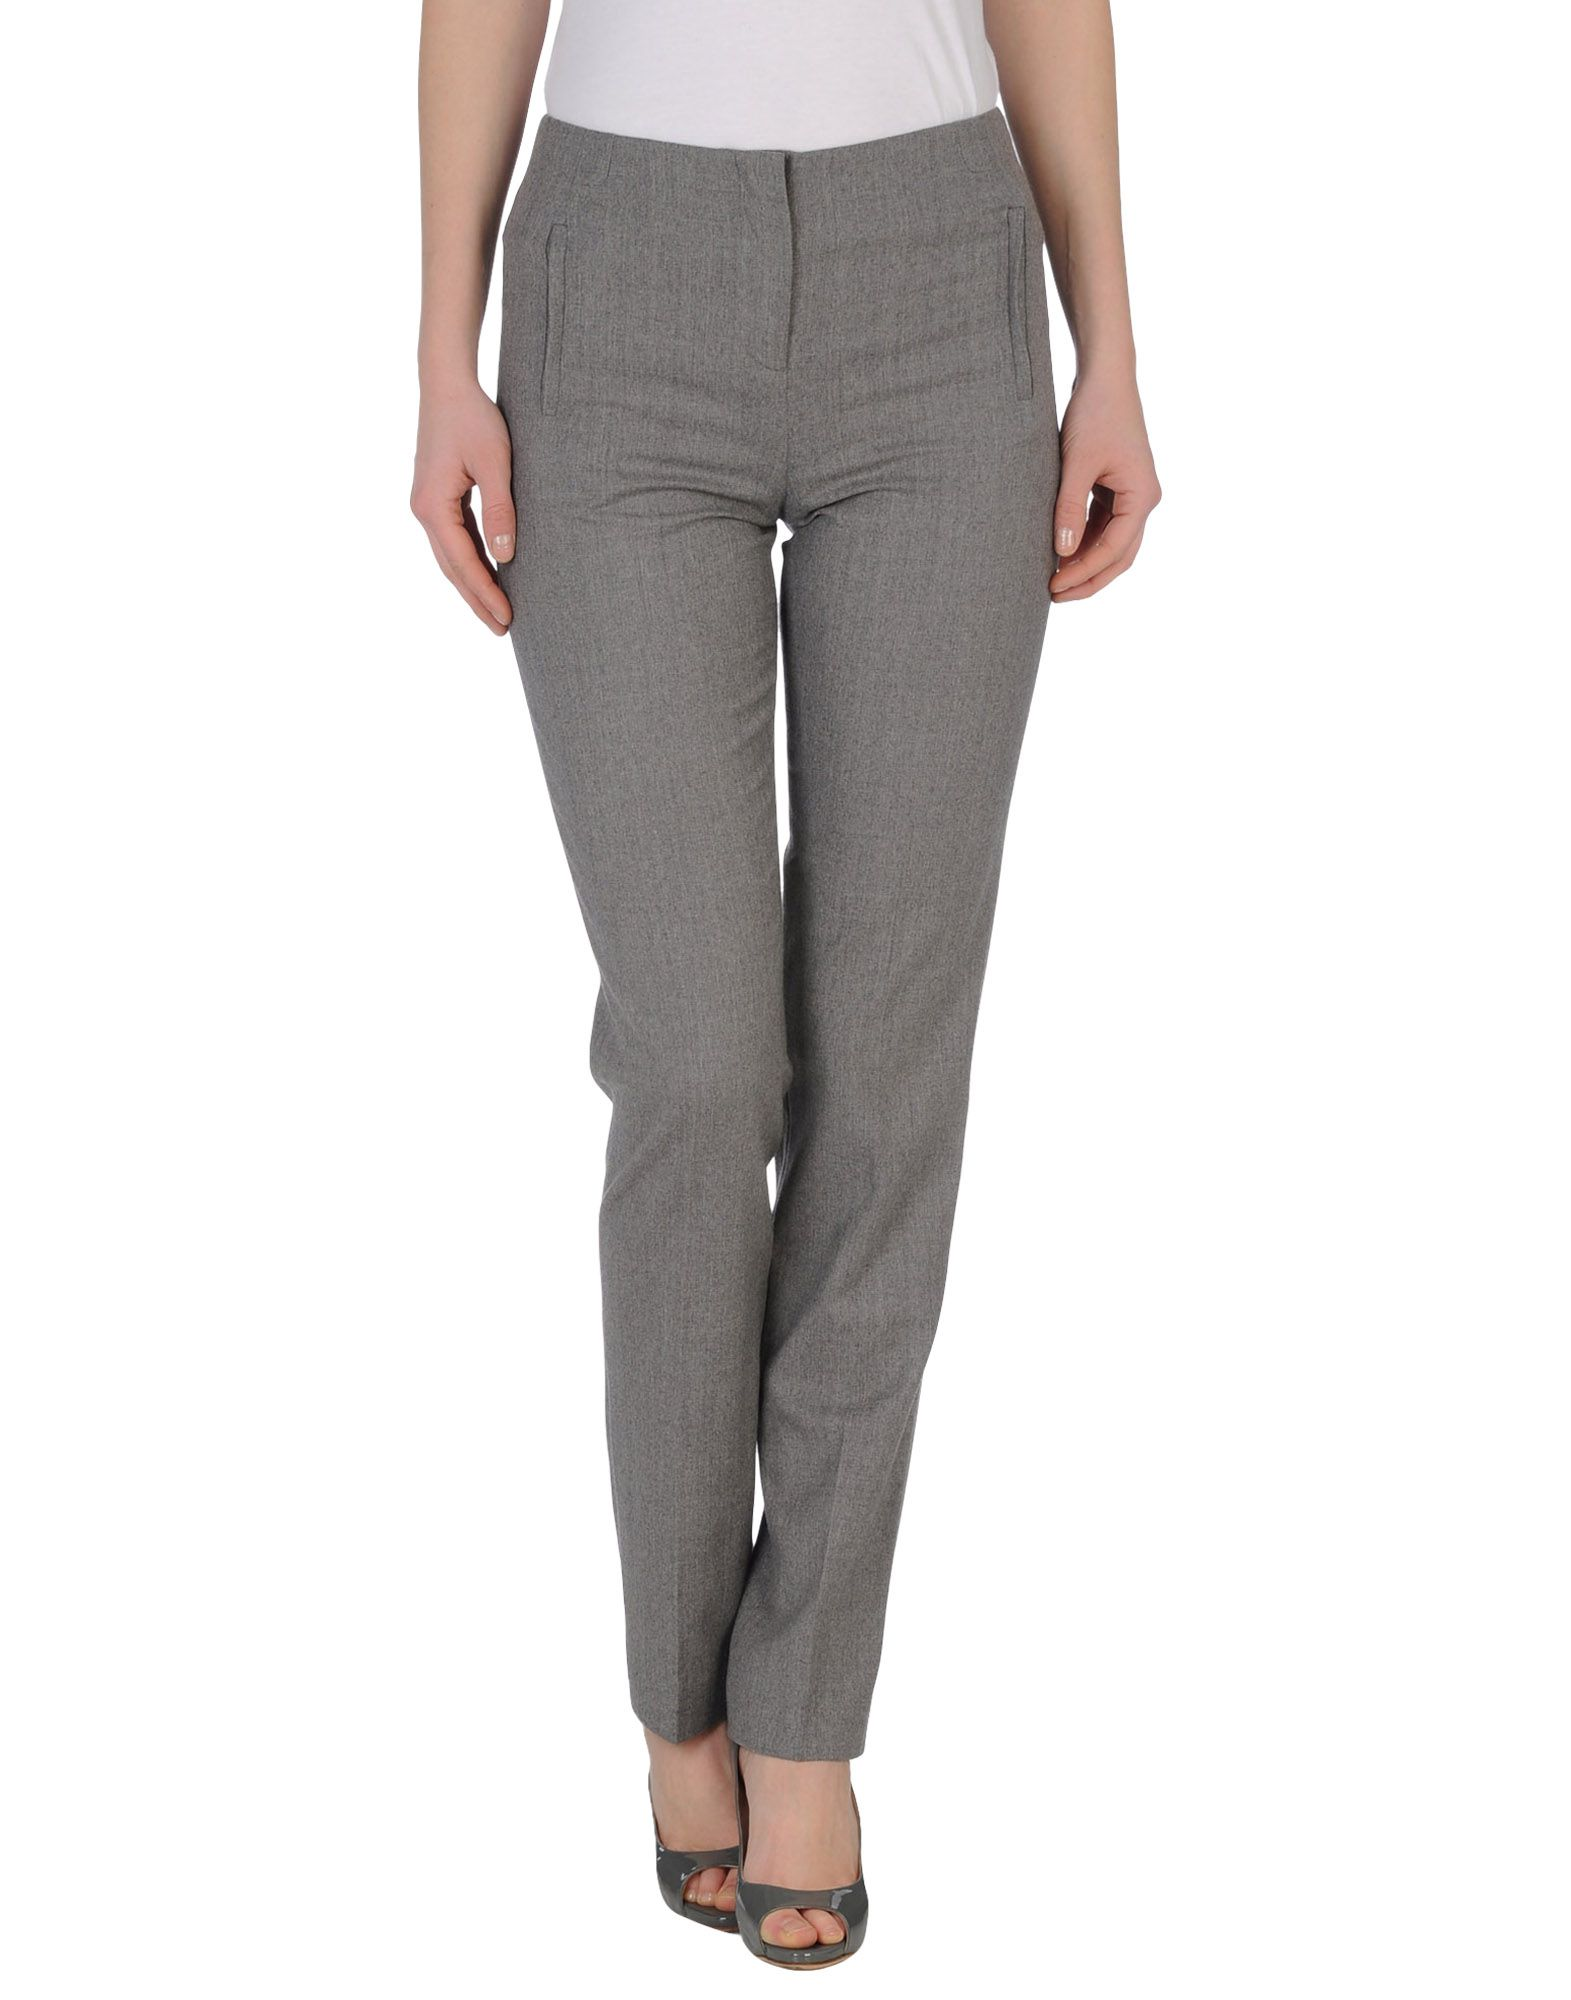 Pantalones Grises De Mujer Brae4dfc2 Breakfreewebcom